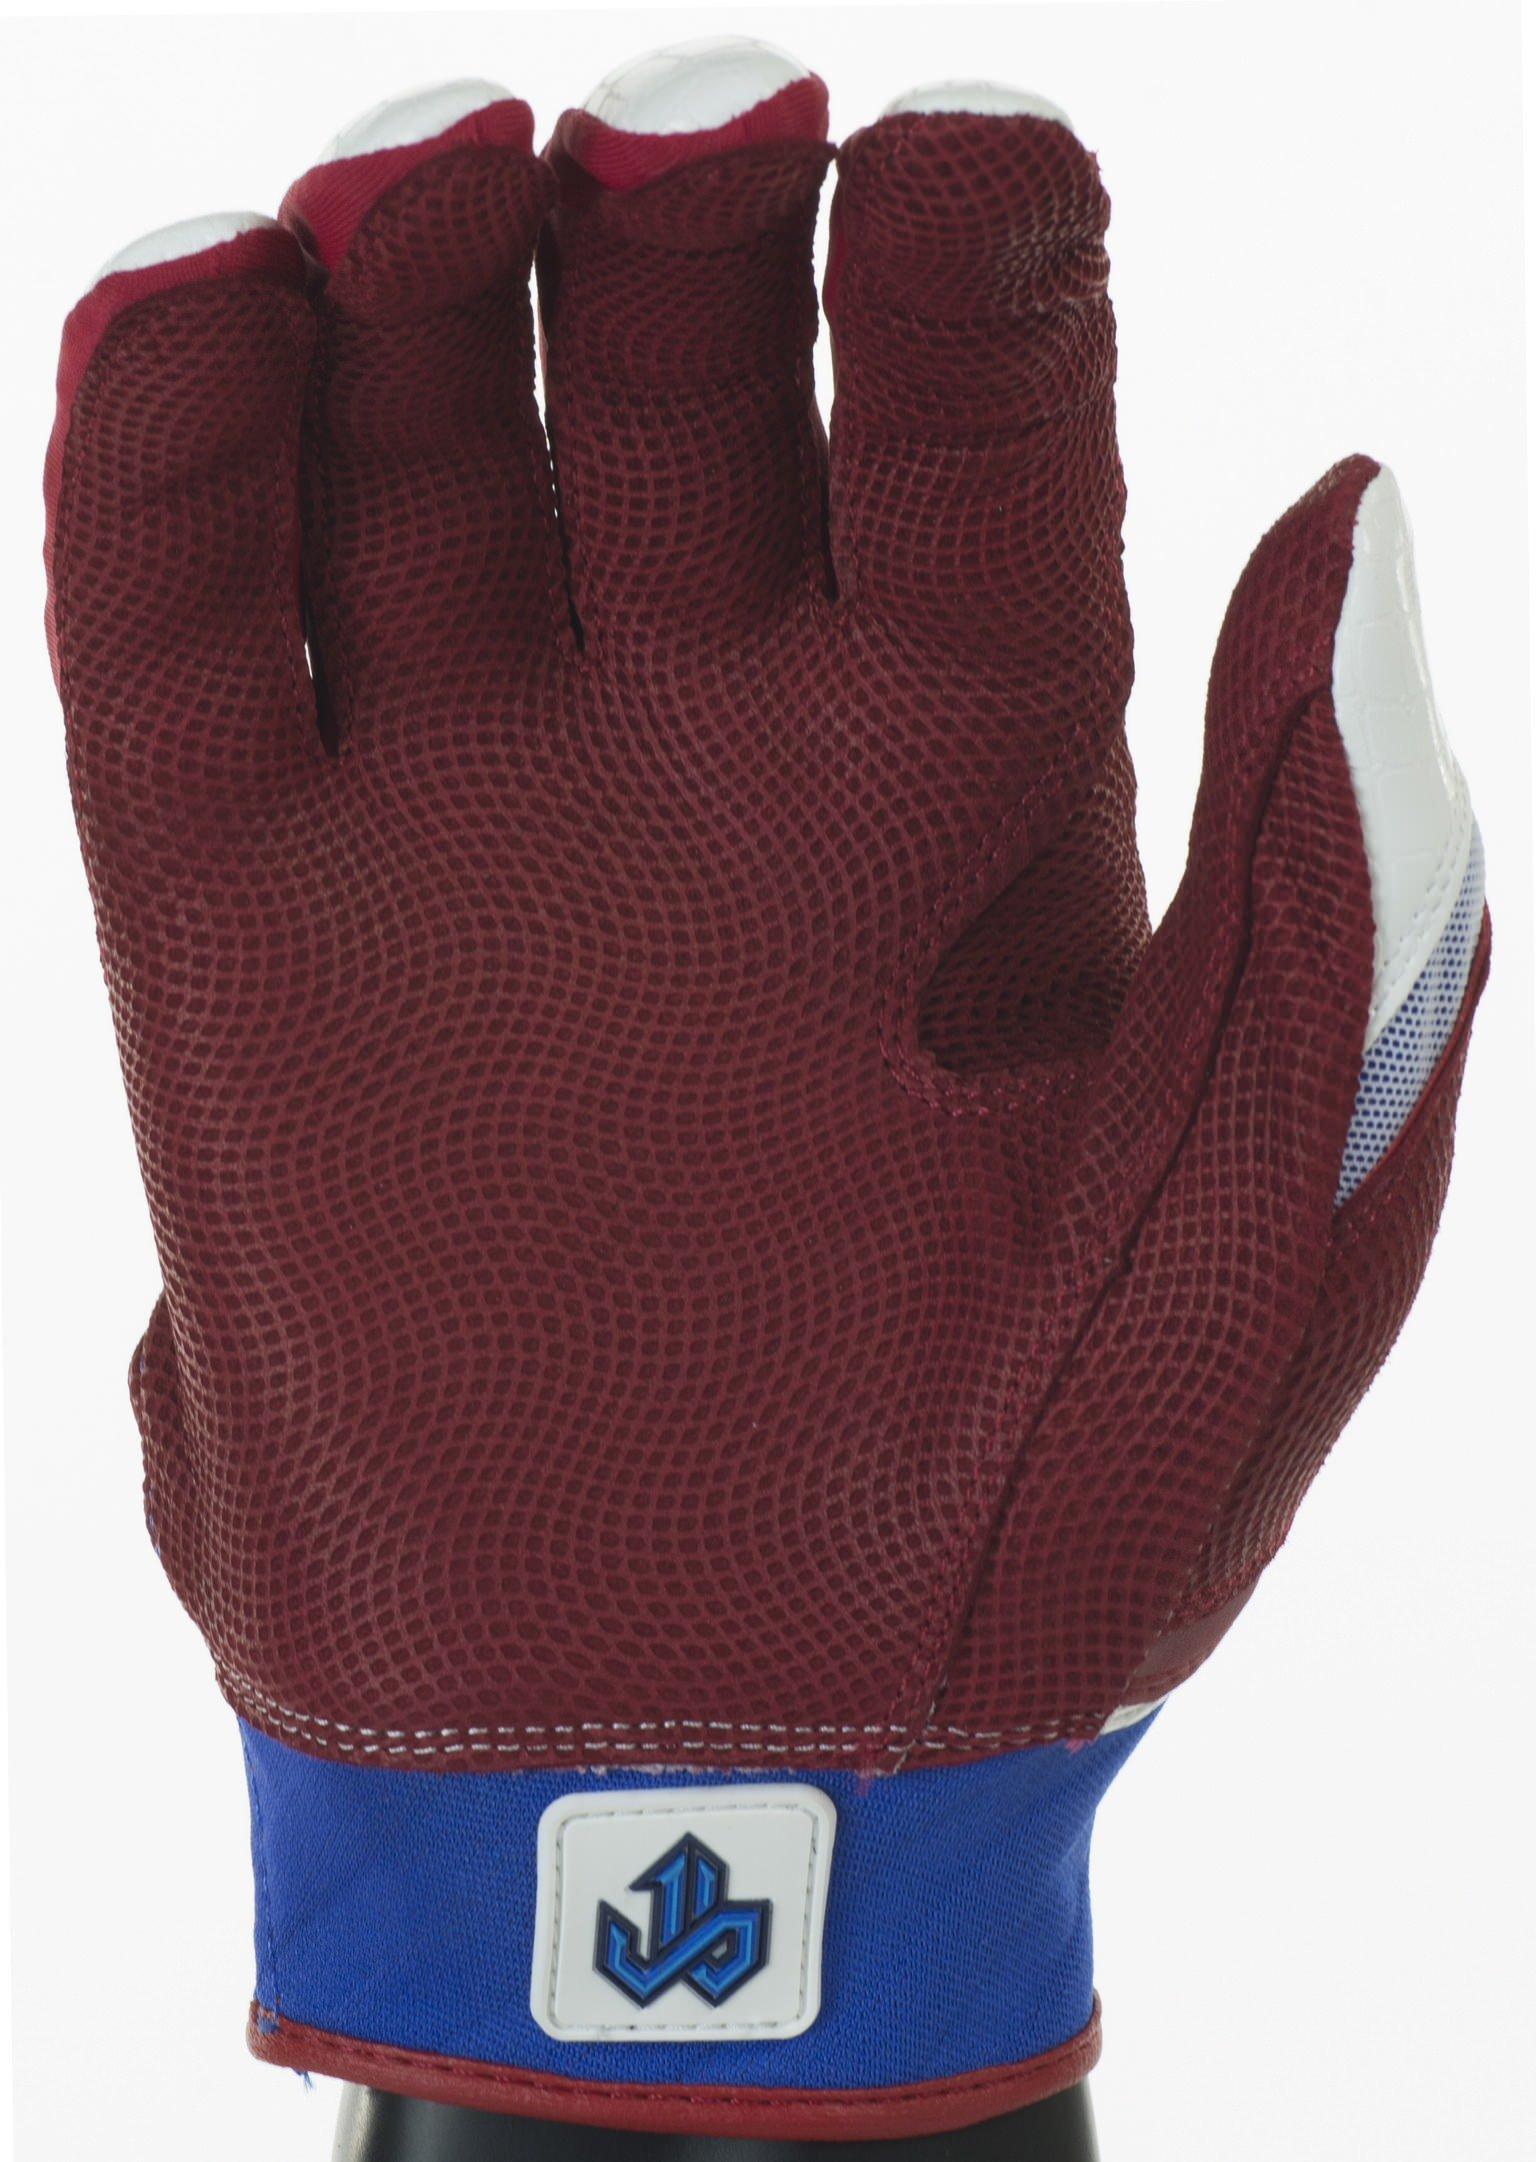 Jose Bautista Marucci Elite 2015 Batting Gloves 3